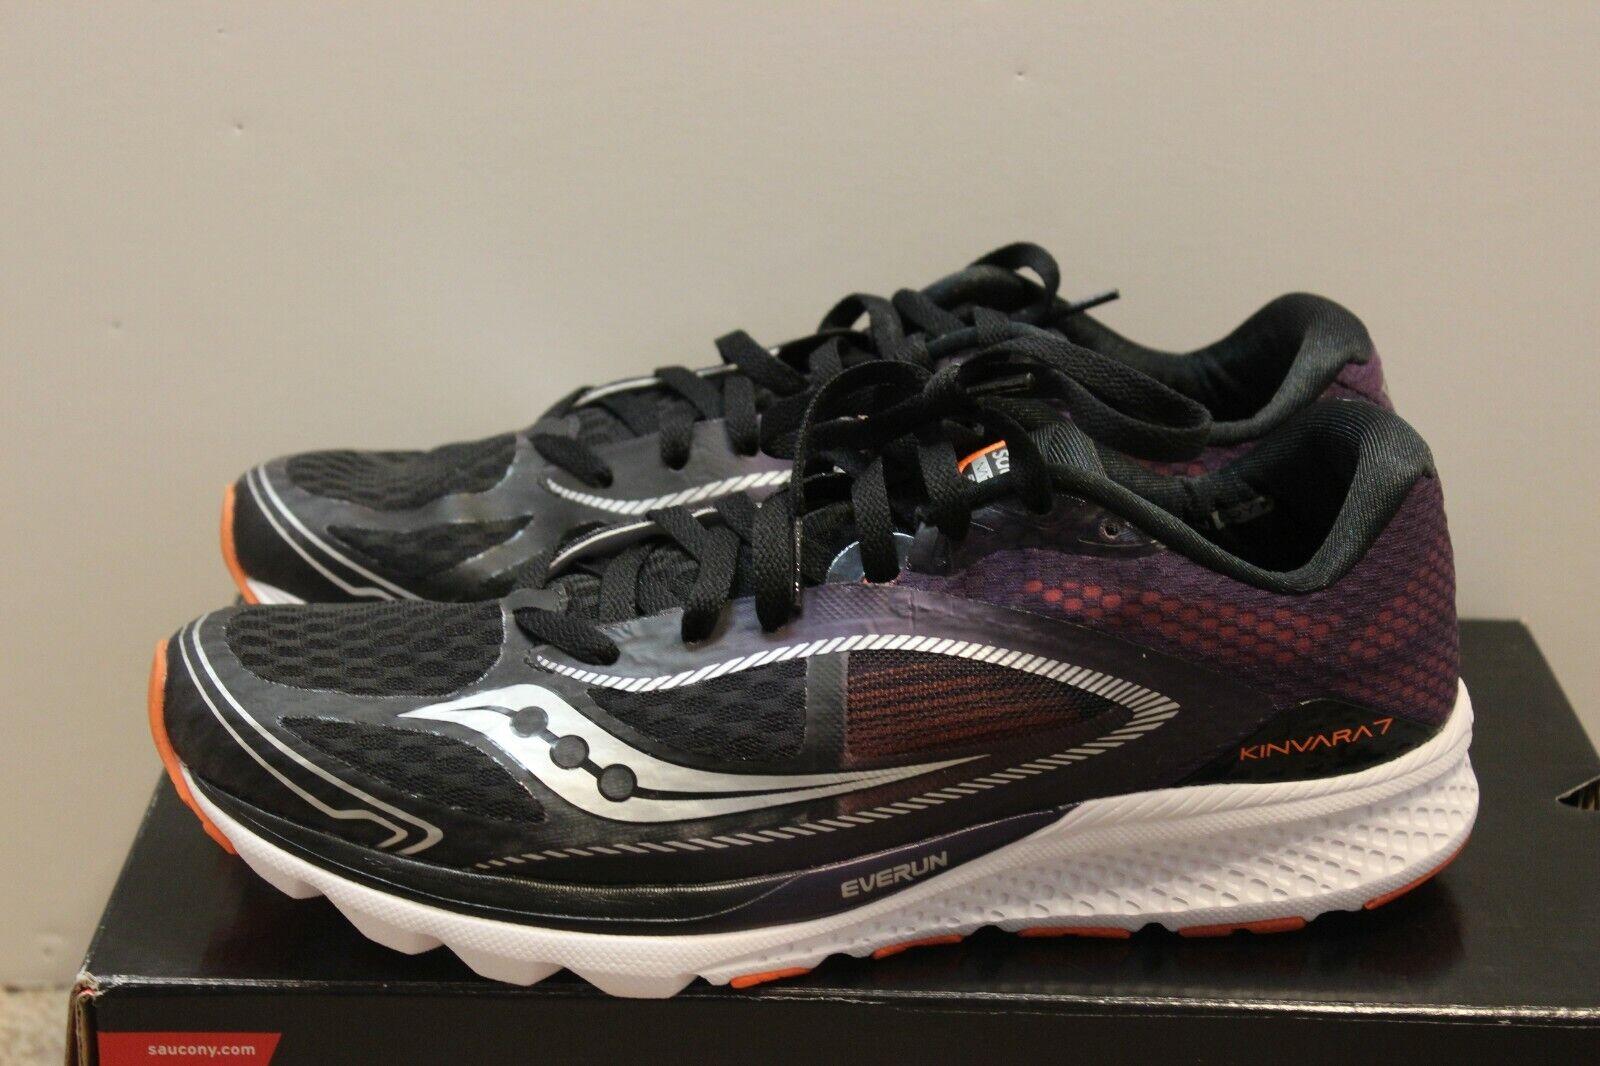 Saucony KINVARA 7 para hombres Zapatos tenis de correr negro púrpura naranja